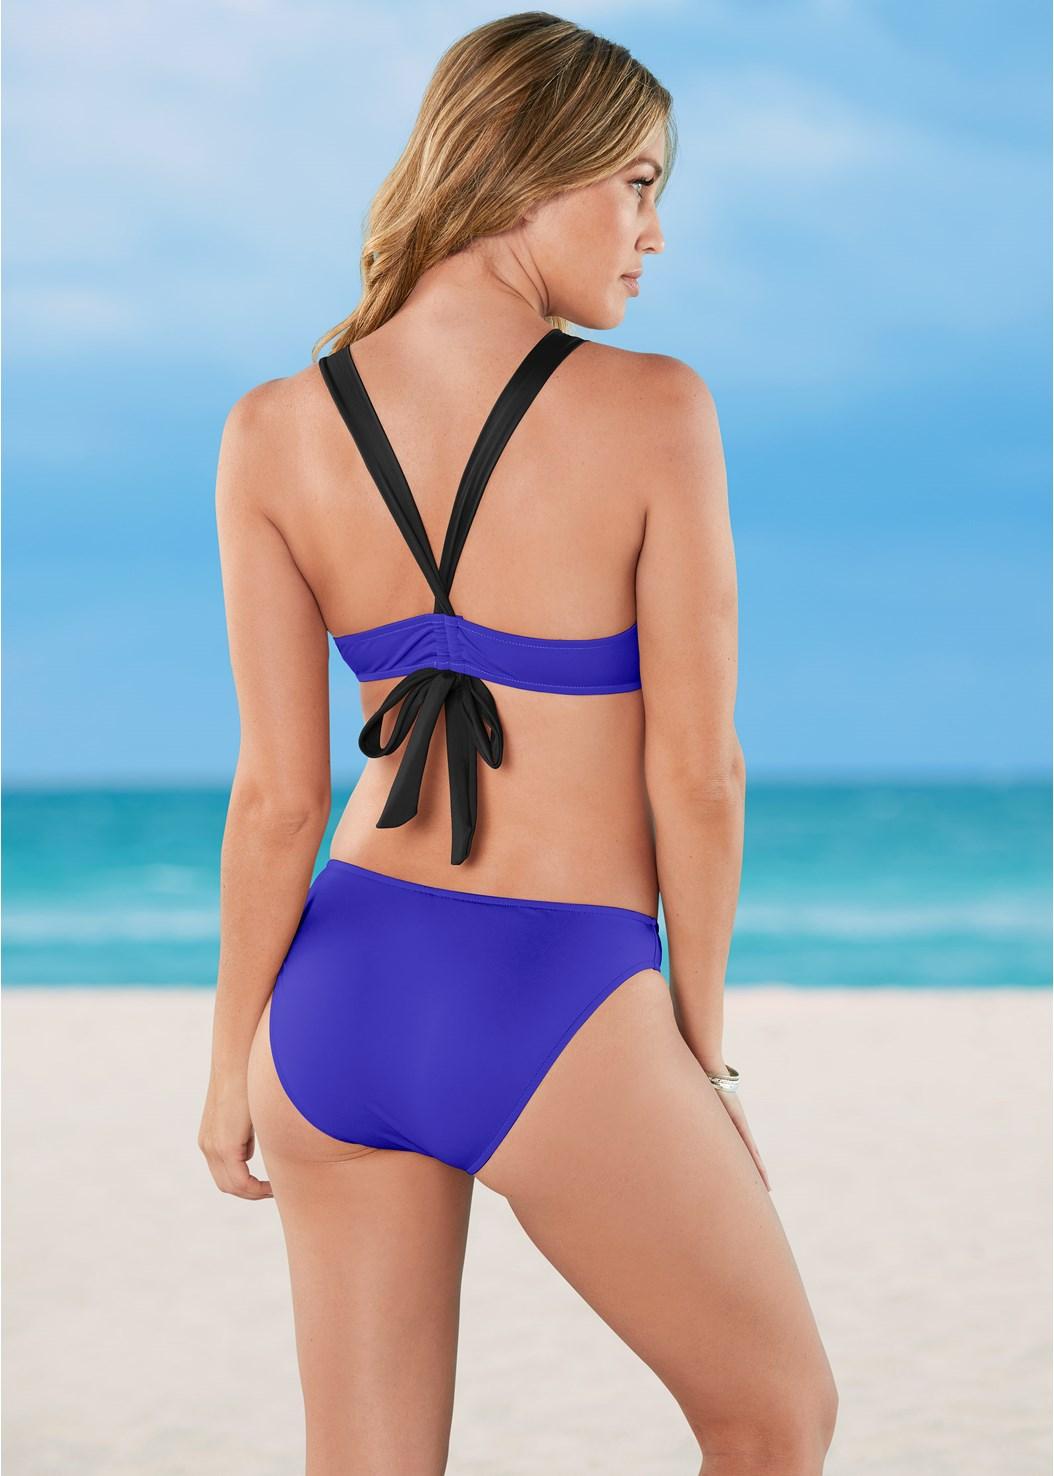 V Back Enhancer,Scoop Front Bikini Bottom,Ruched Waist Bikini Bottom